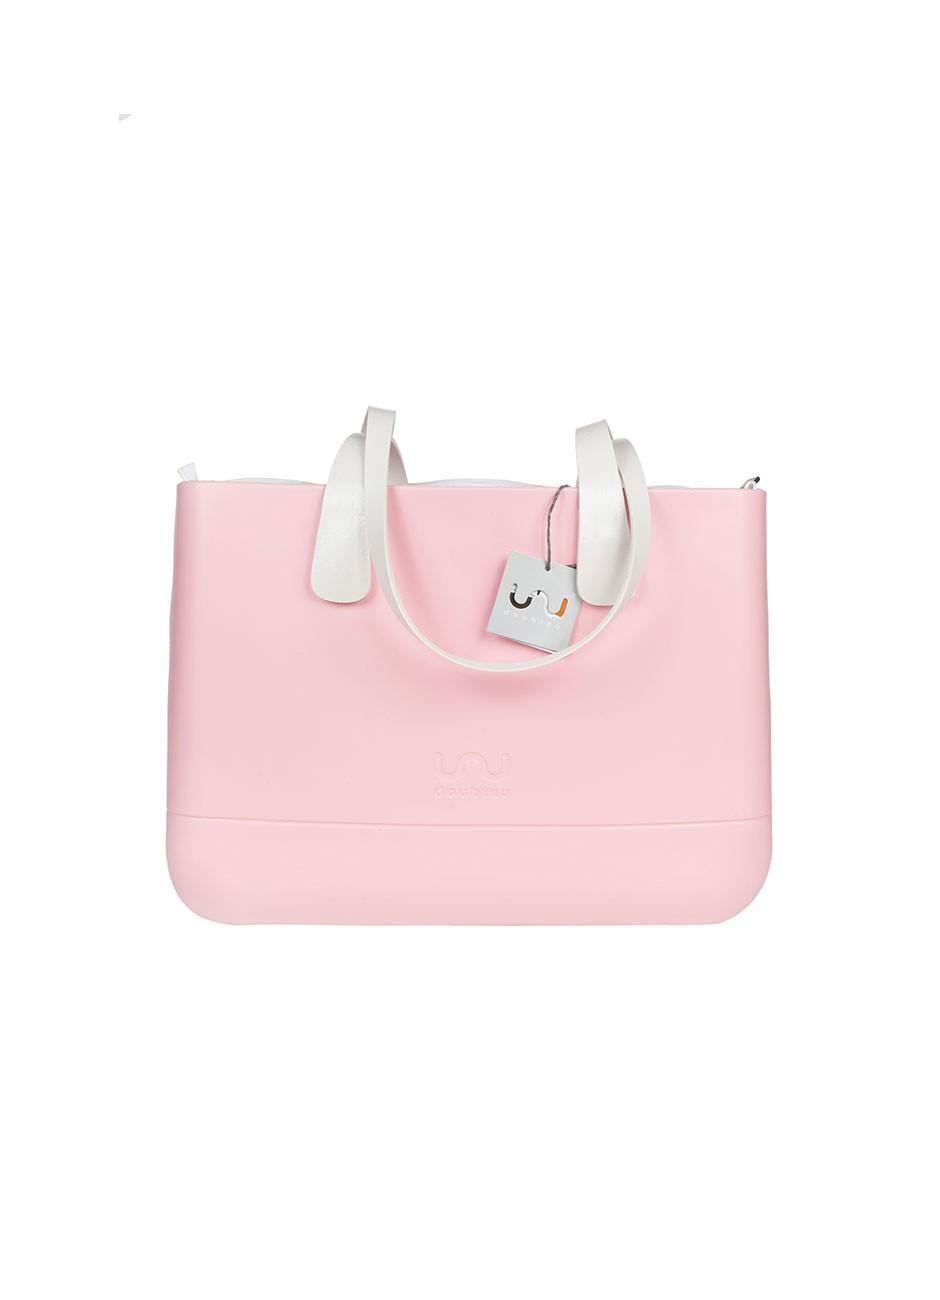 torba-large-elegant-pink.jpg